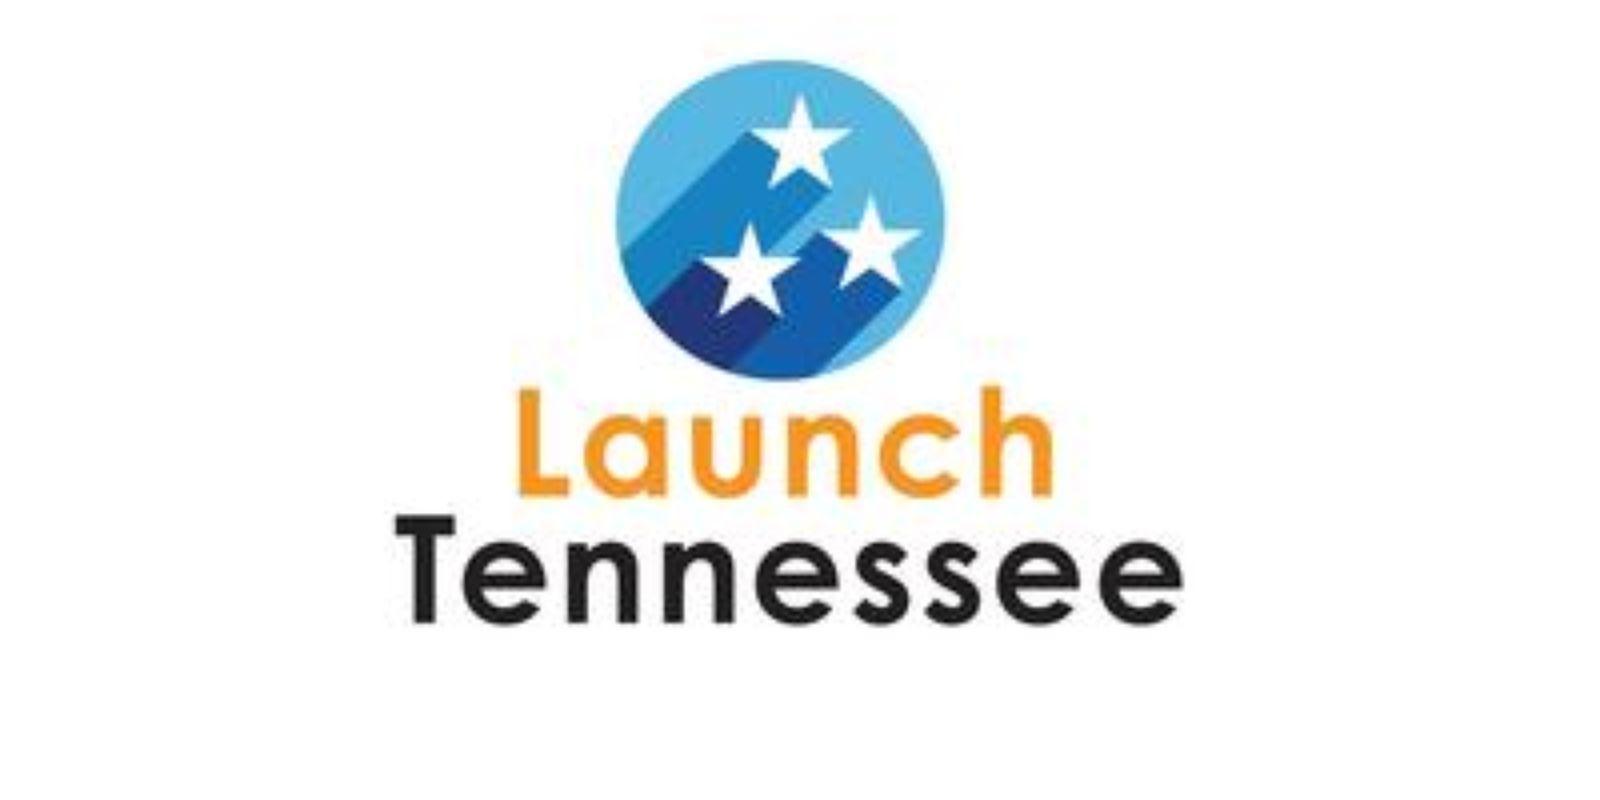 Paid Summer 2018 Internship at Launch Tennessee